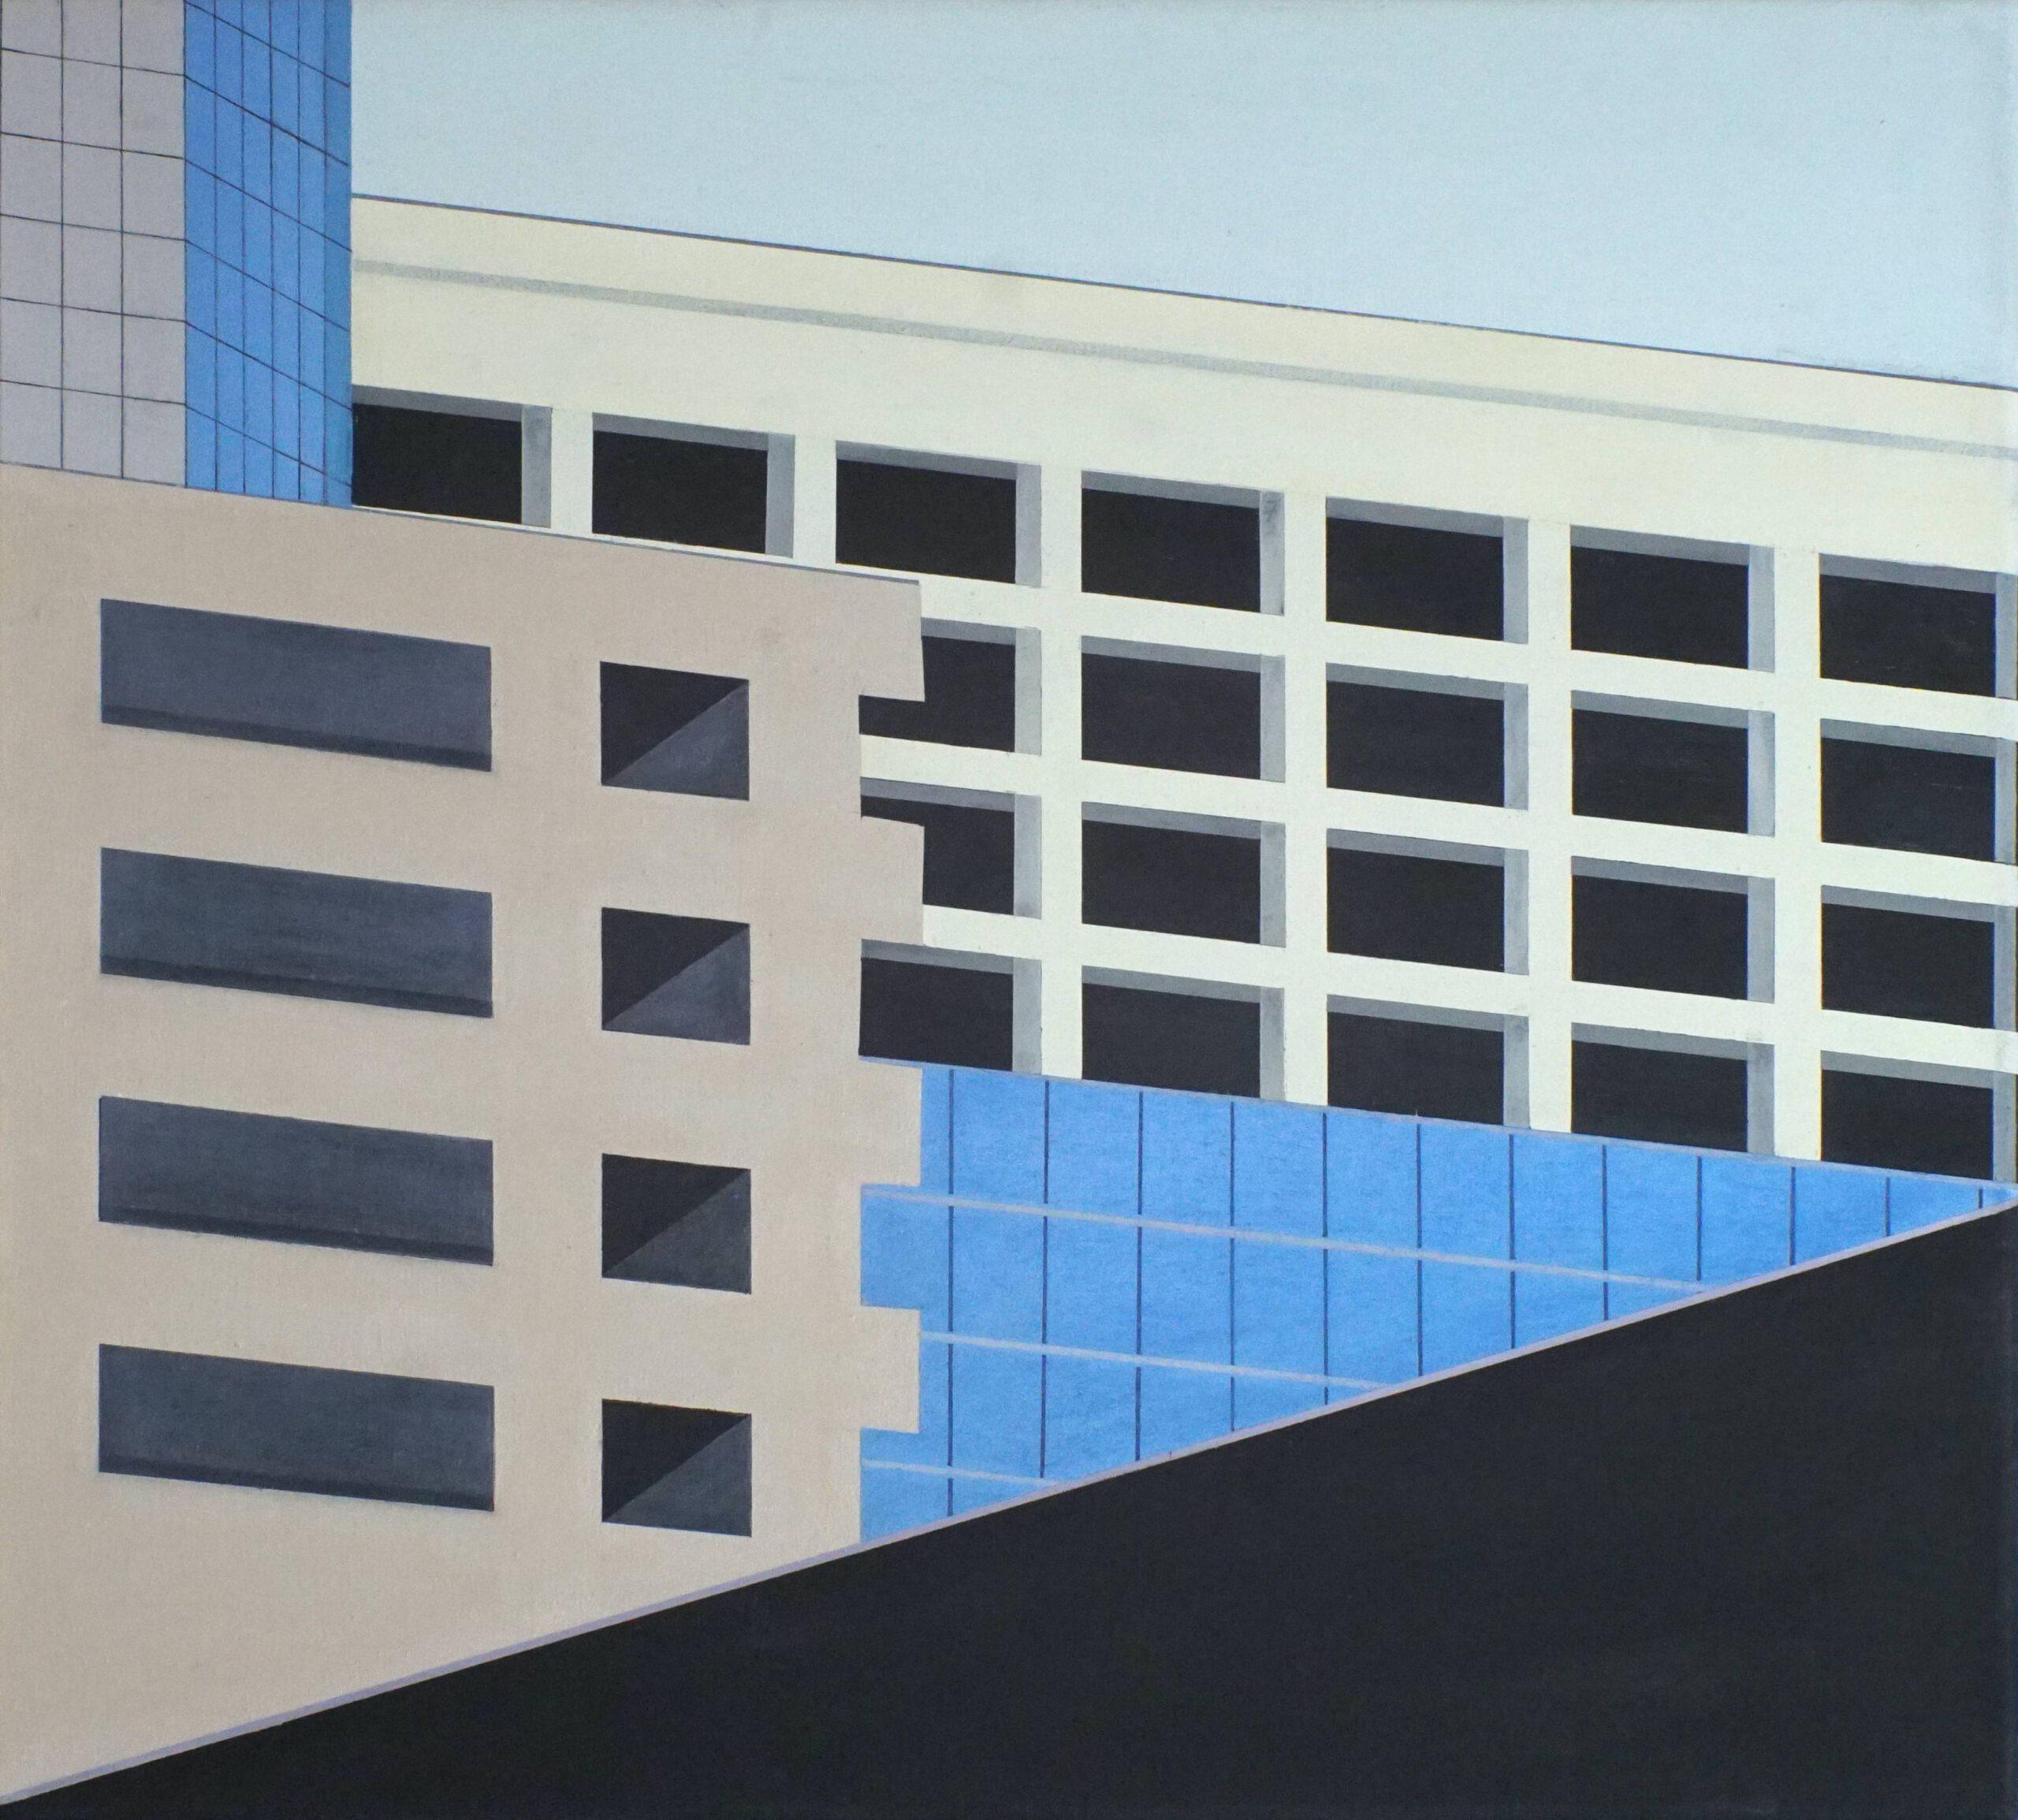 Am Highway VI, 2020, 45 x 50 cm, Öl/Lw, Oil on Canvas